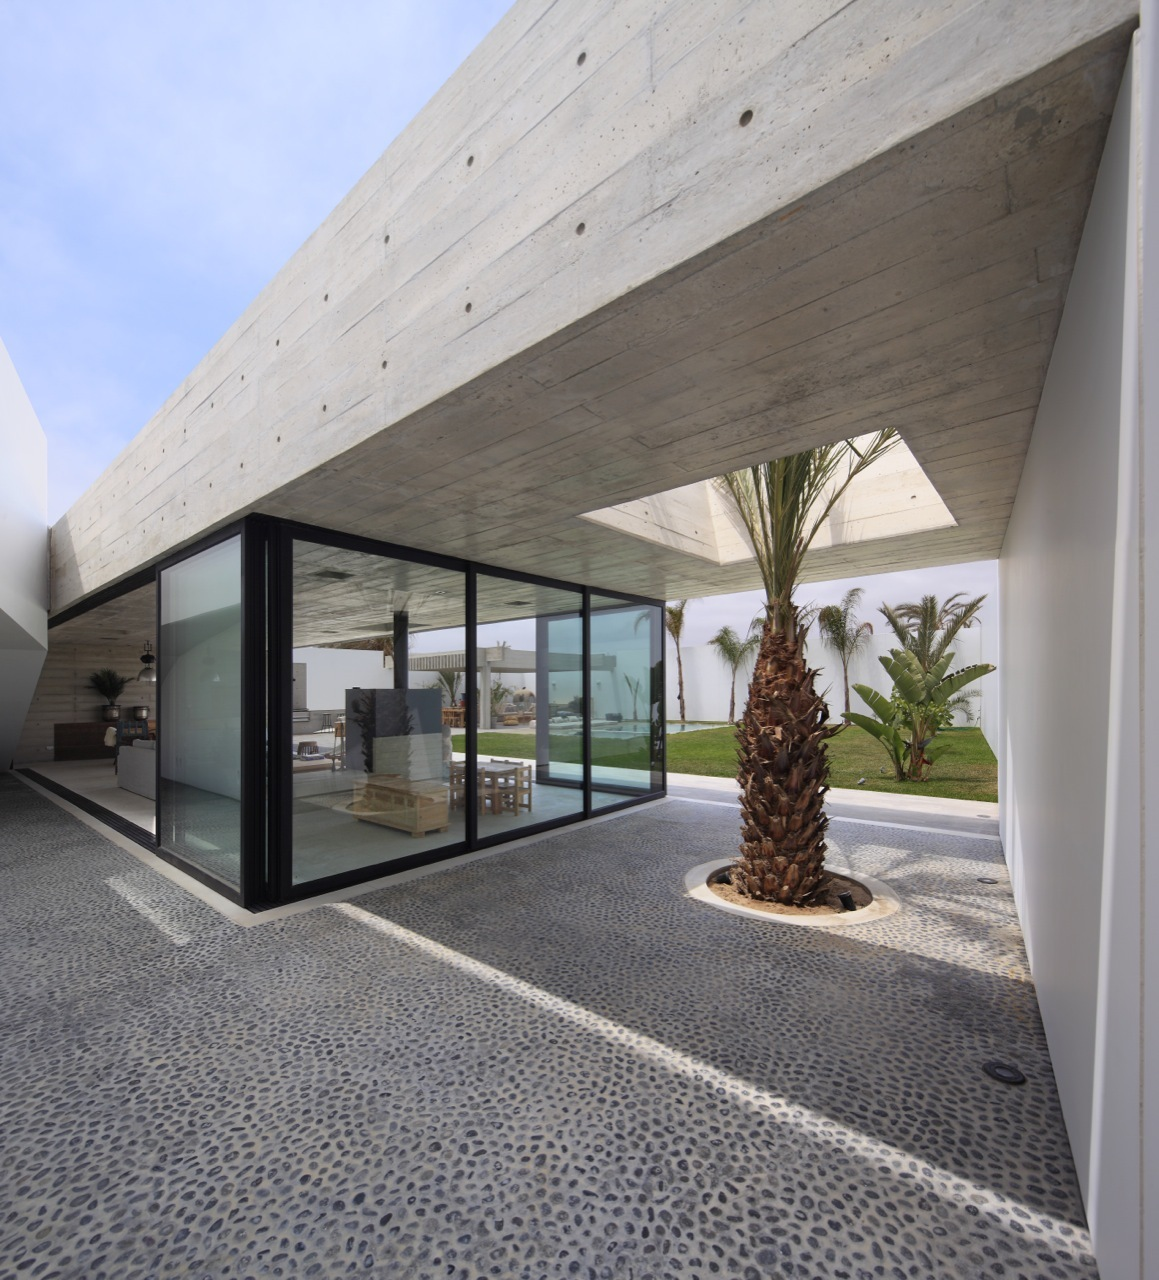 Casa Paracas / Llosa Cortegana